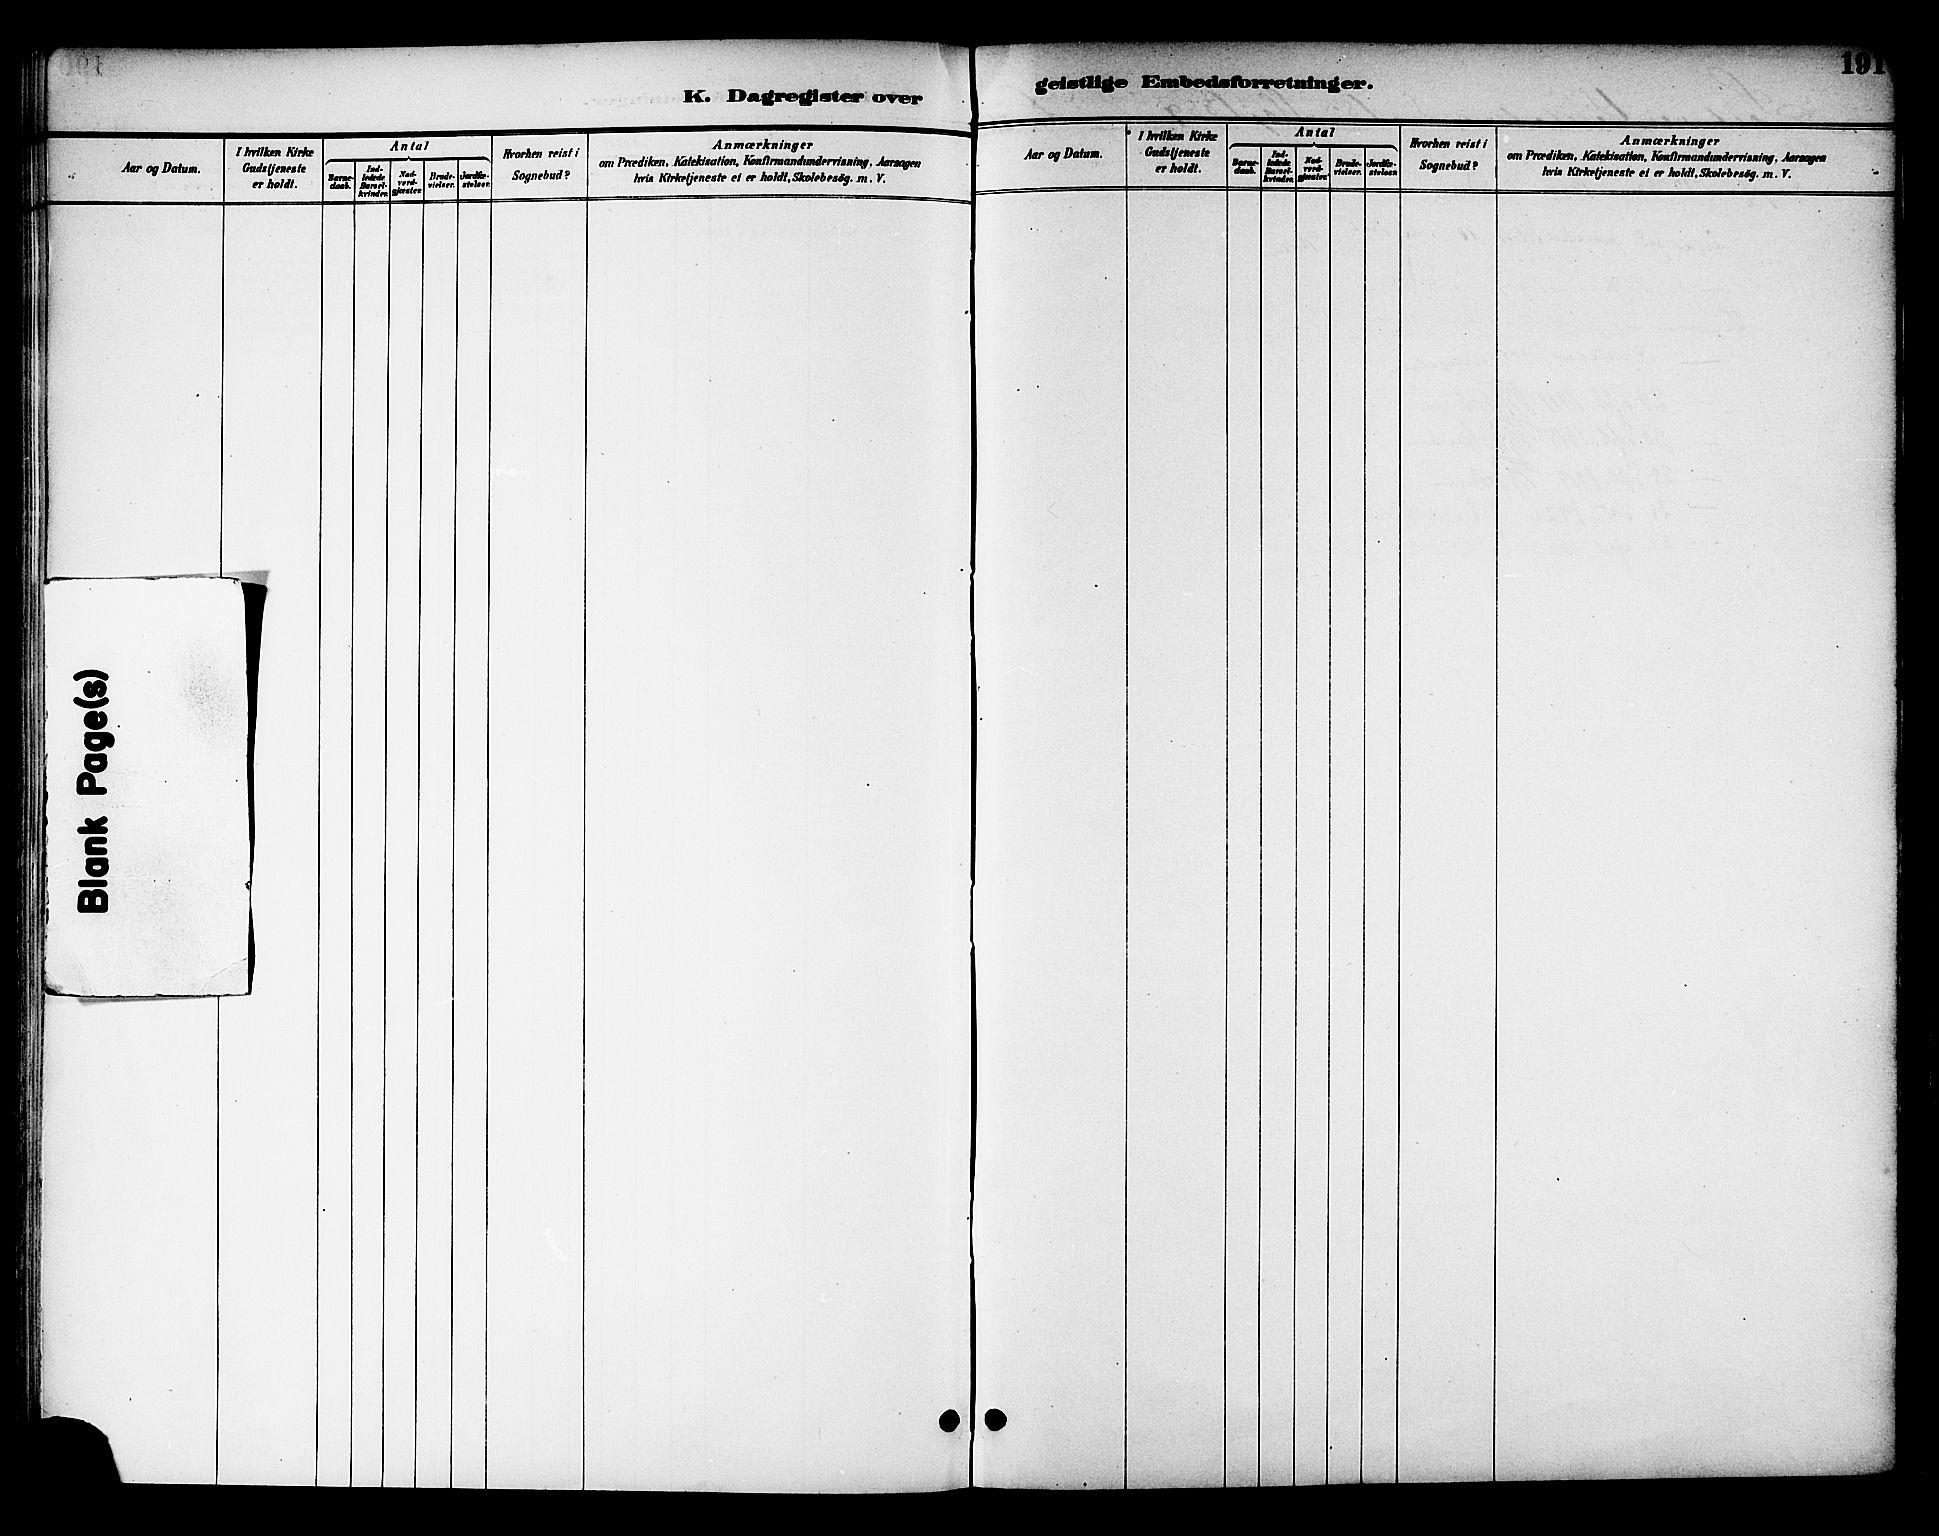 SAT, Ministerialprotokoller, klokkerbøker og fødselsregistre - Nord-Trøndelag, 768/L0575: Dagregister nr. 766A09, 1889-1931, s. 191